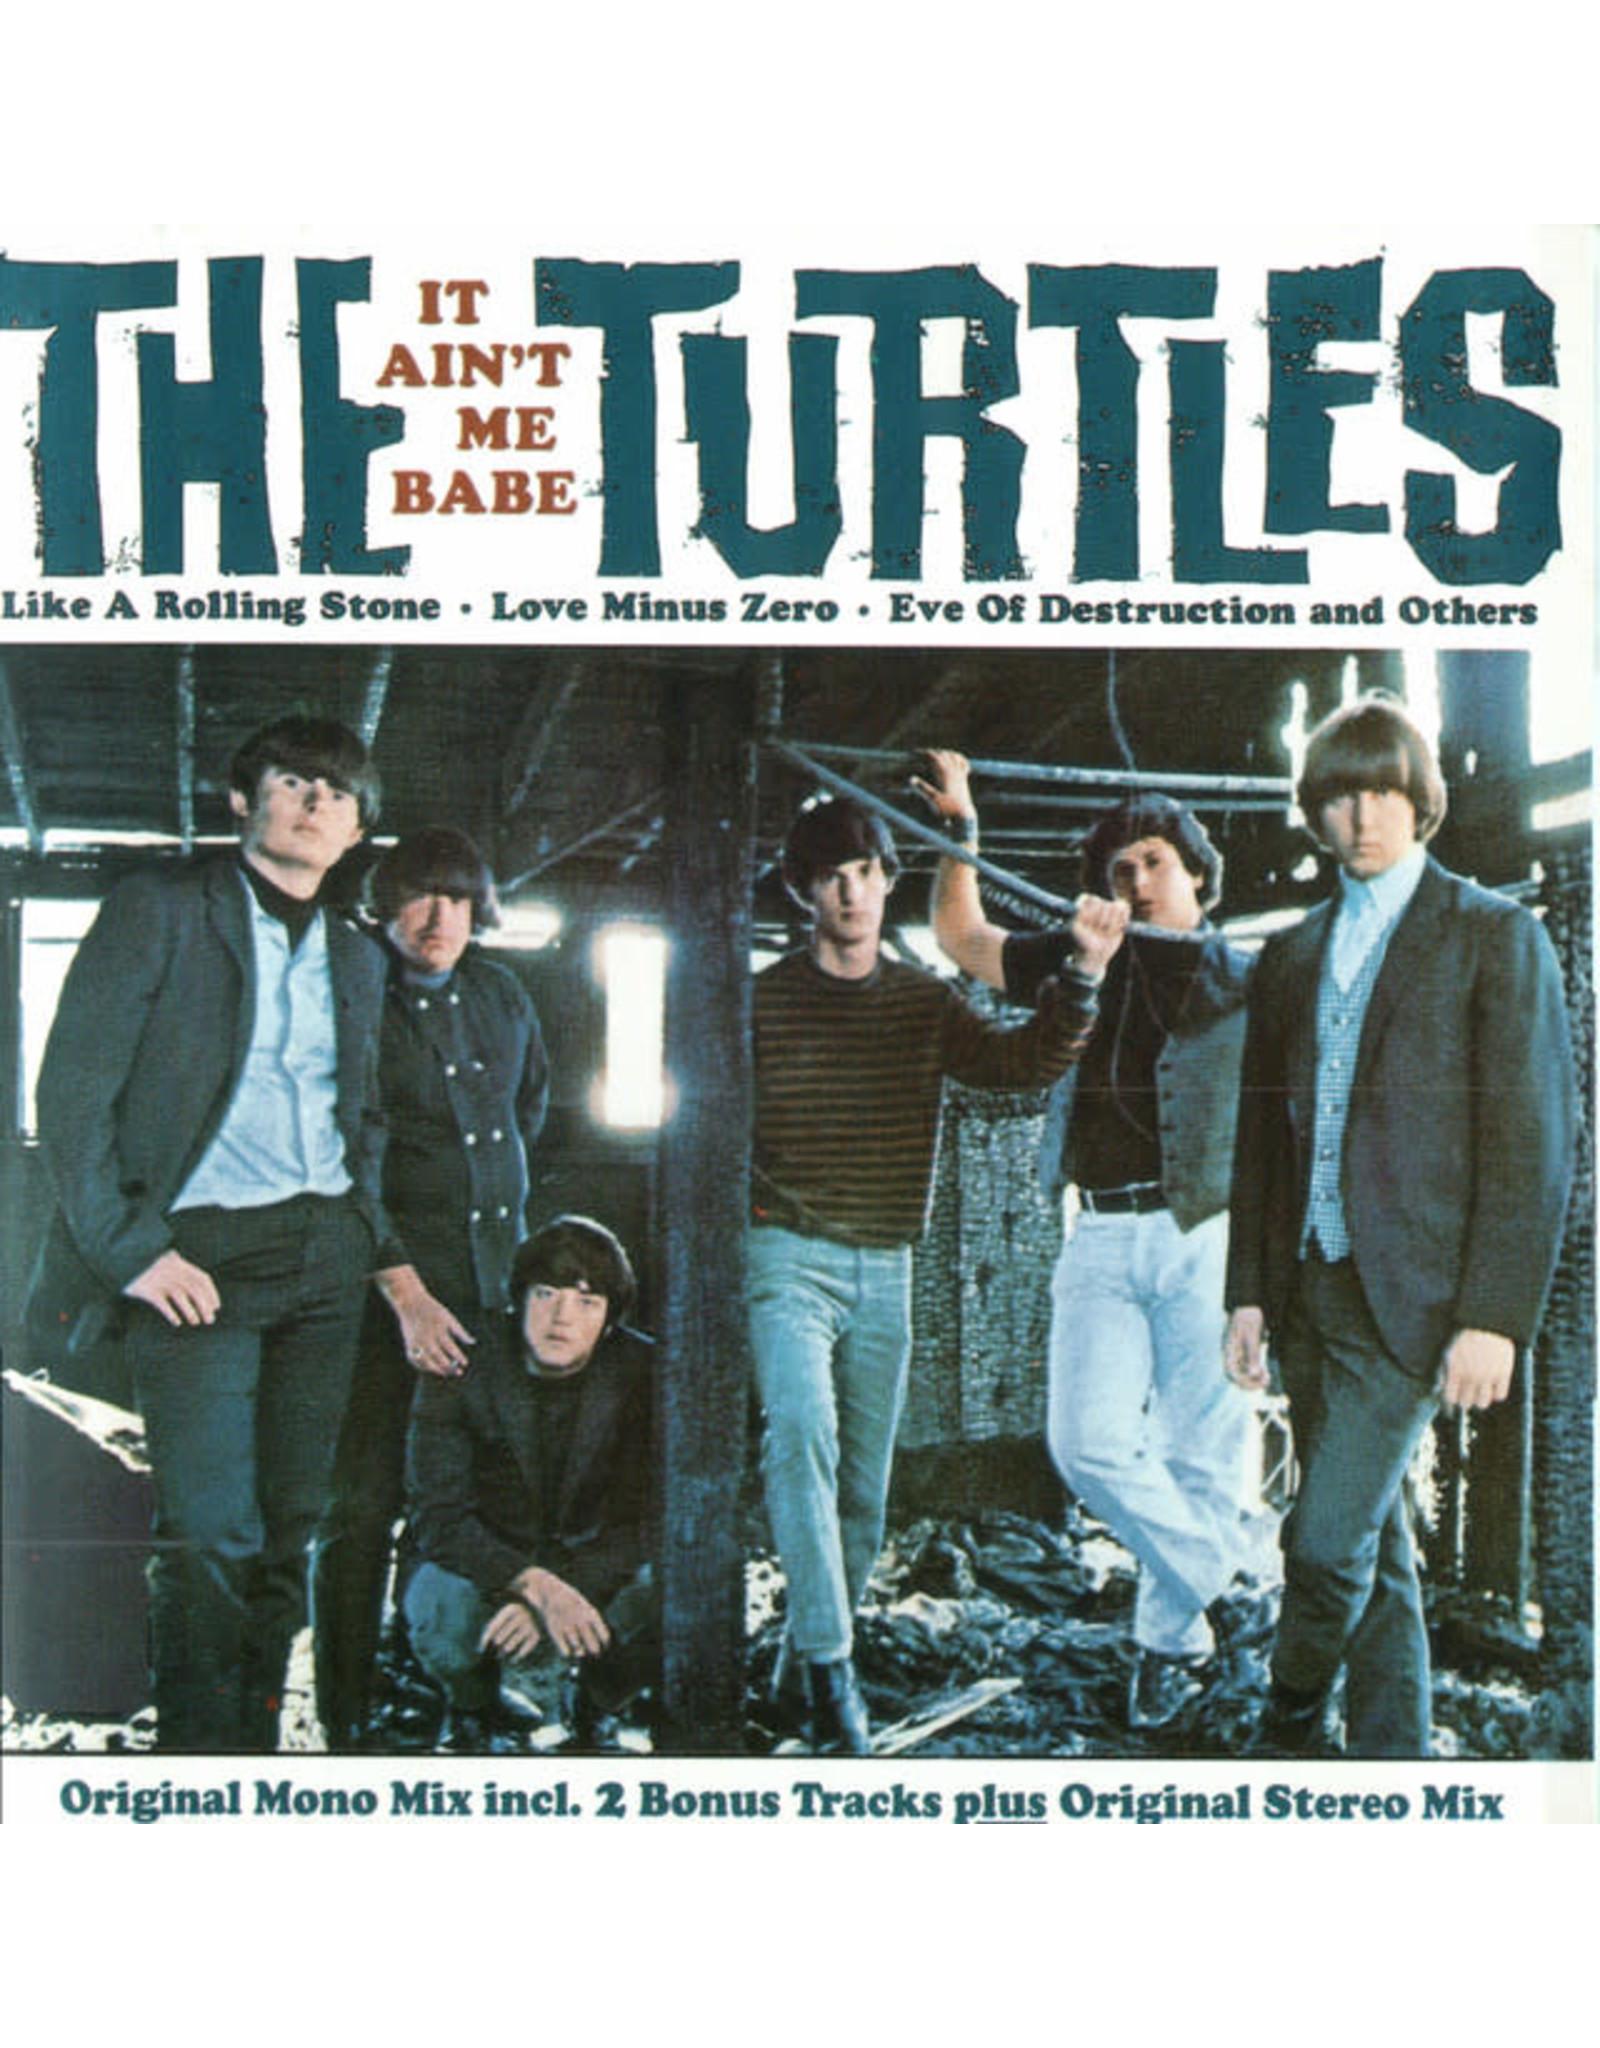 Vinyl The Turtles - It Ain't Me Babe